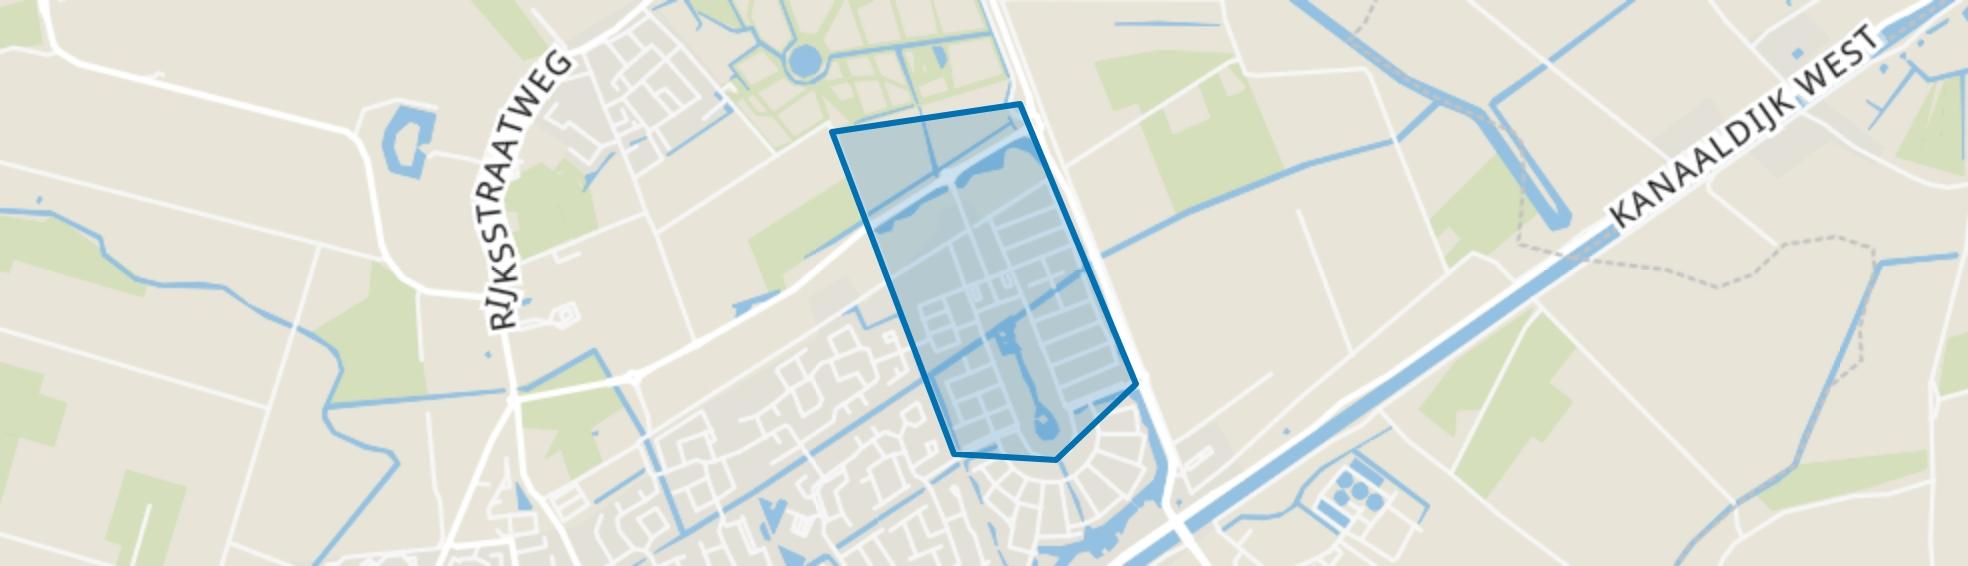 Altena, Hellevoetsluis map